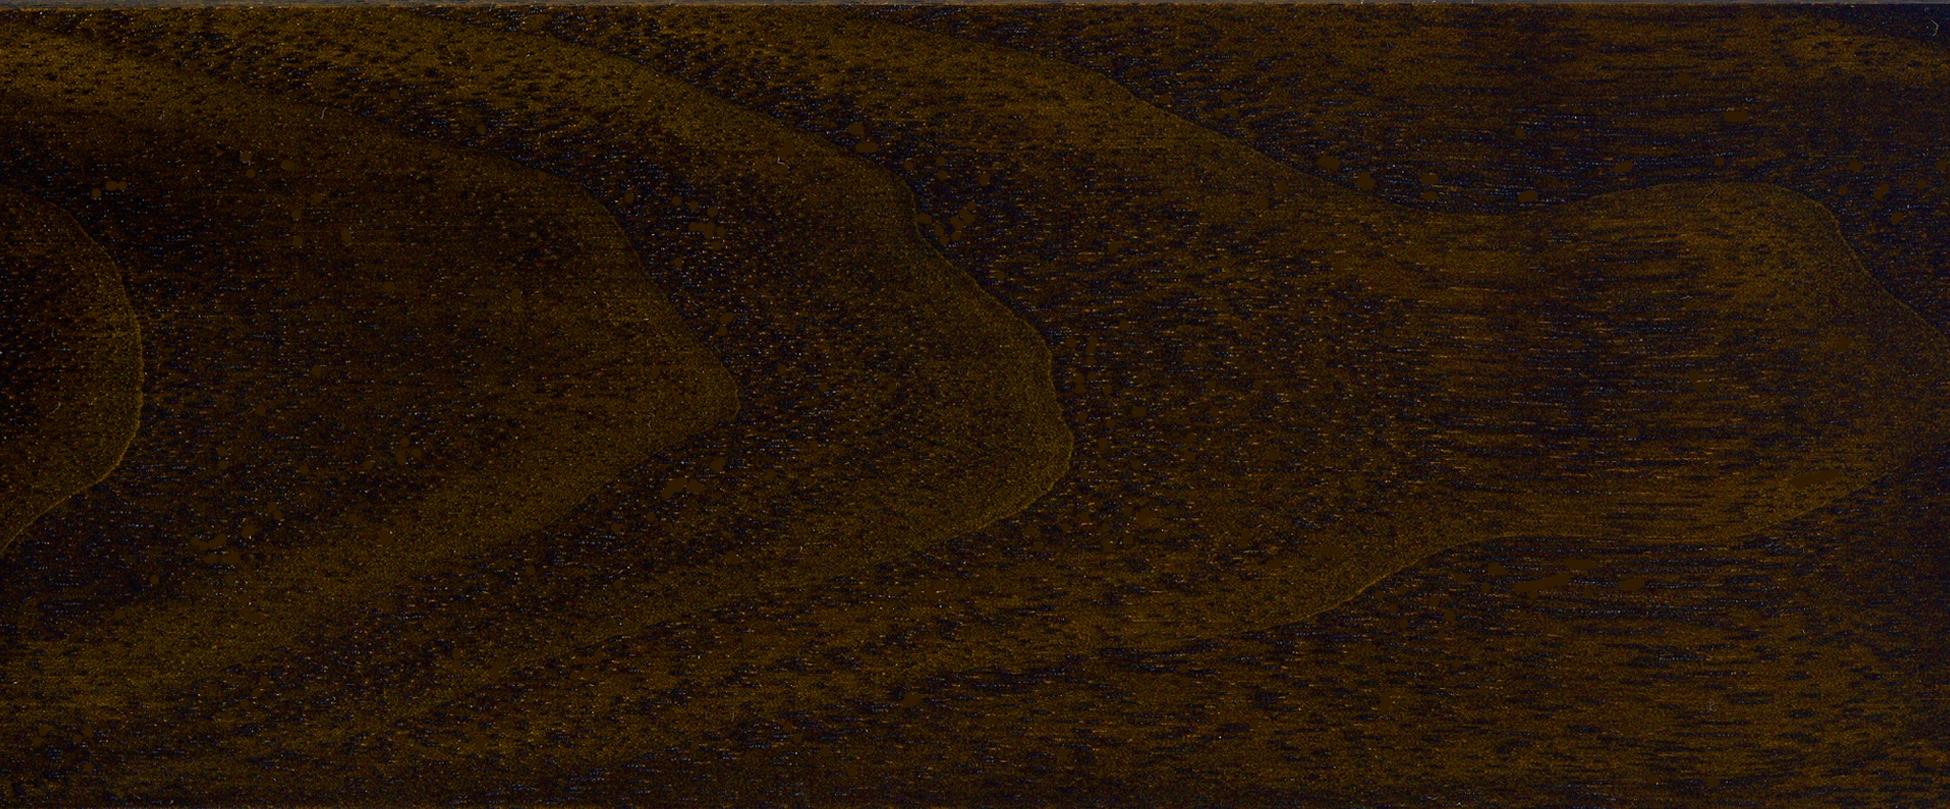 walnut - marrakesh stain